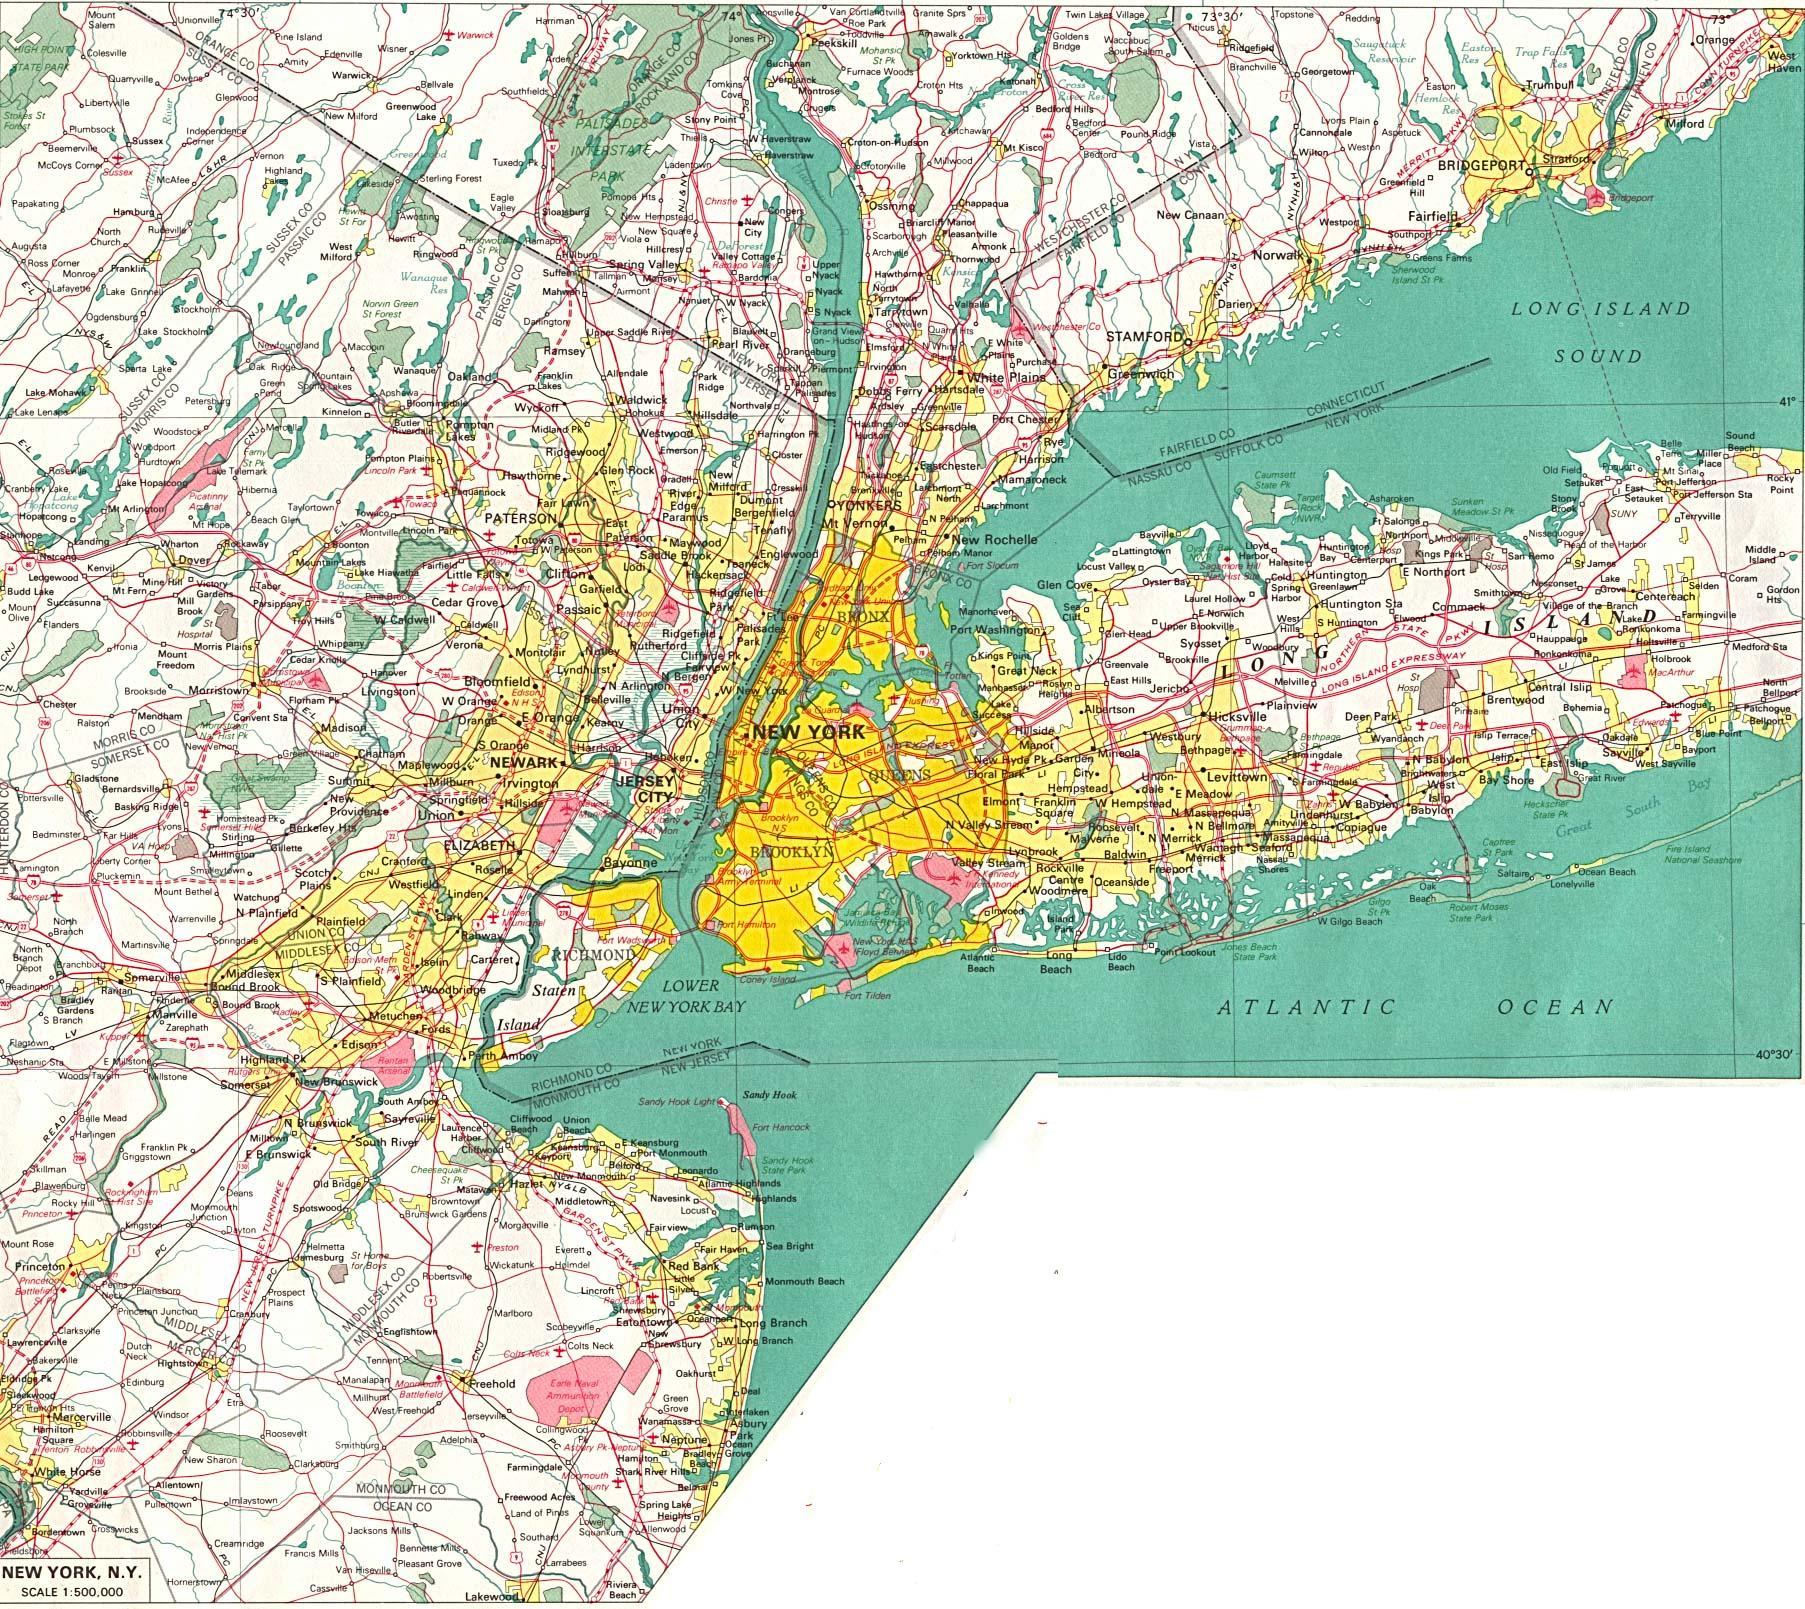 New York Kartalla New York Sijainti Kartalla New York Usa